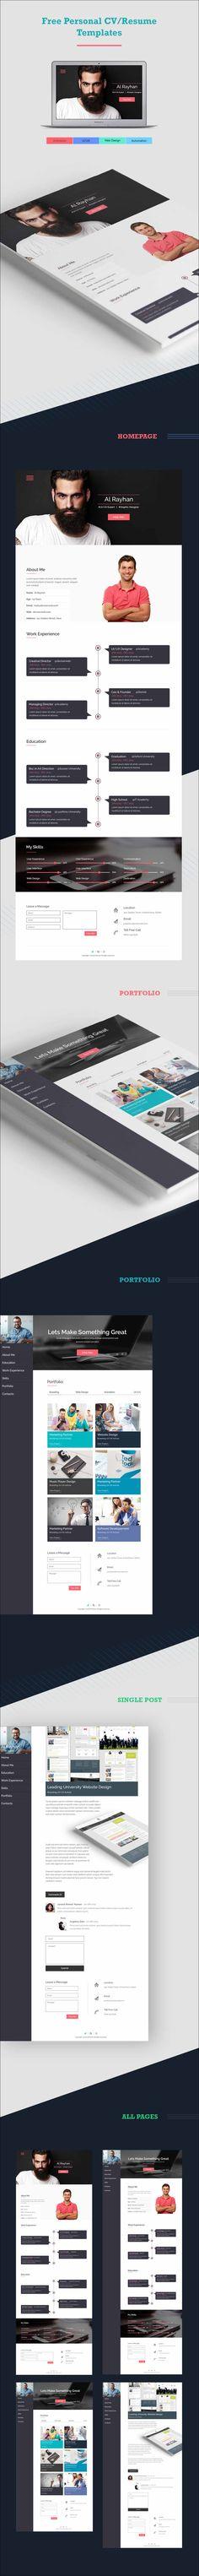 Hoki Premium Responsive #Joomla #Virtuemart Template Website - personal resume website template